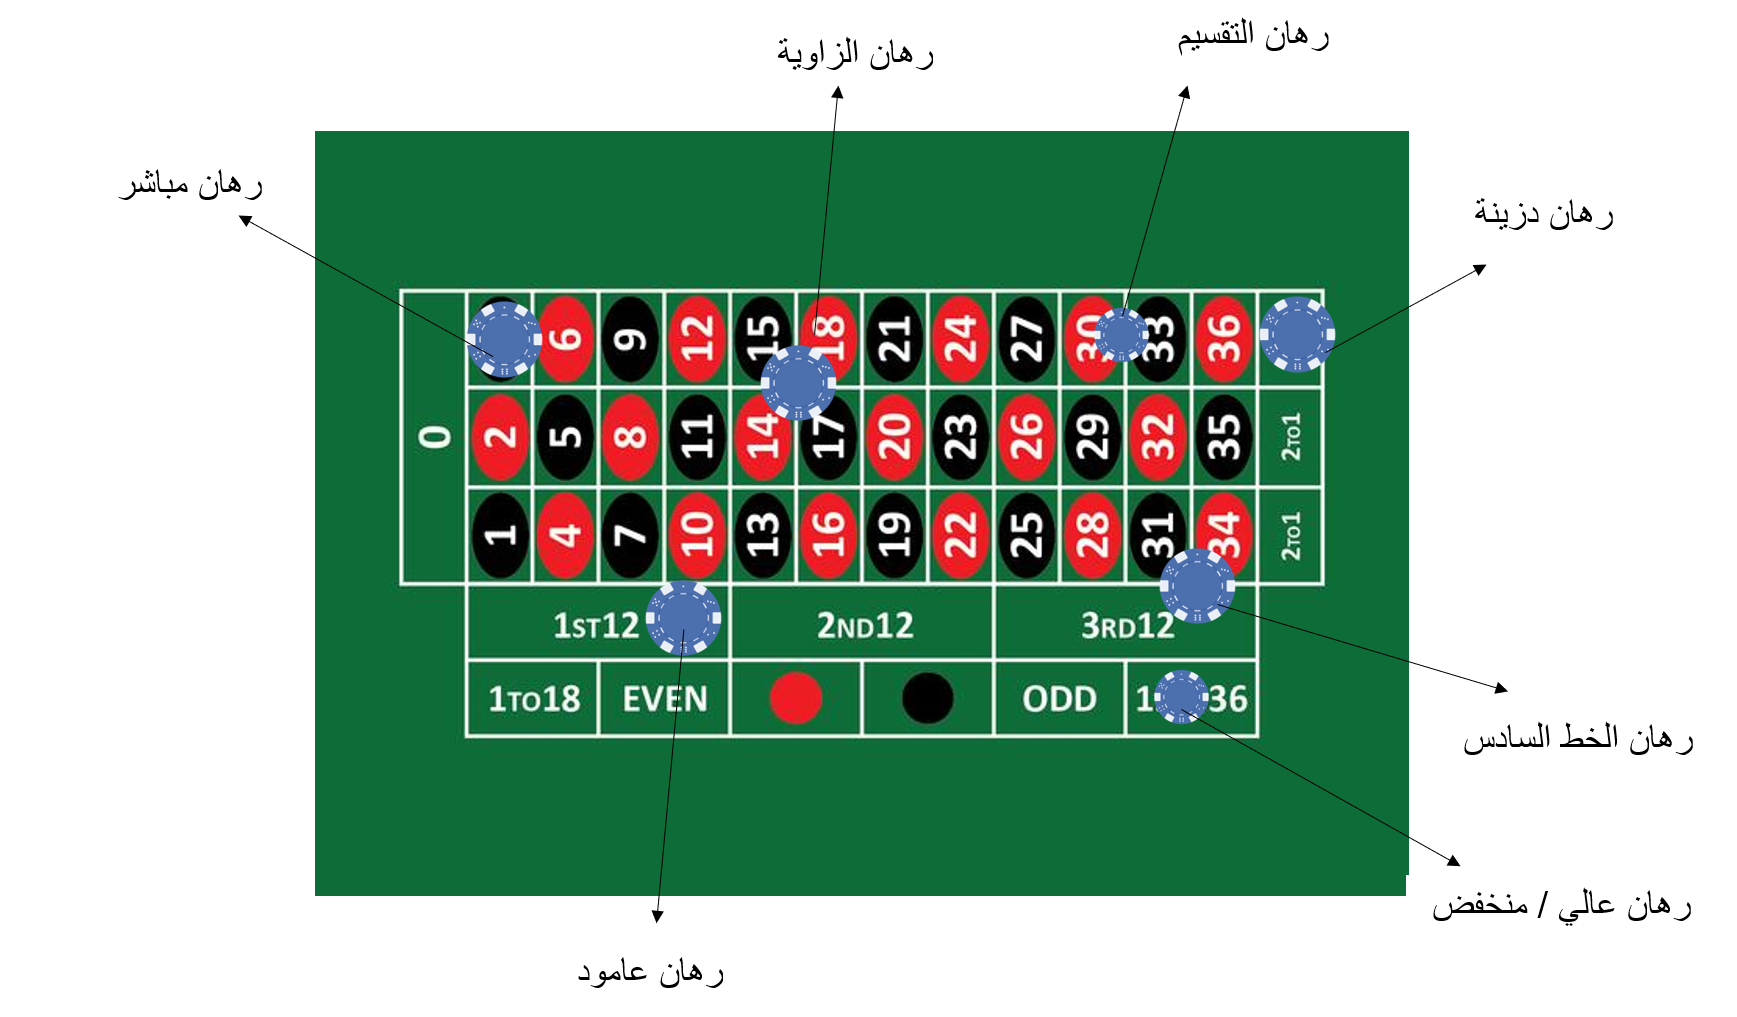 ا استراتيجية - 15601